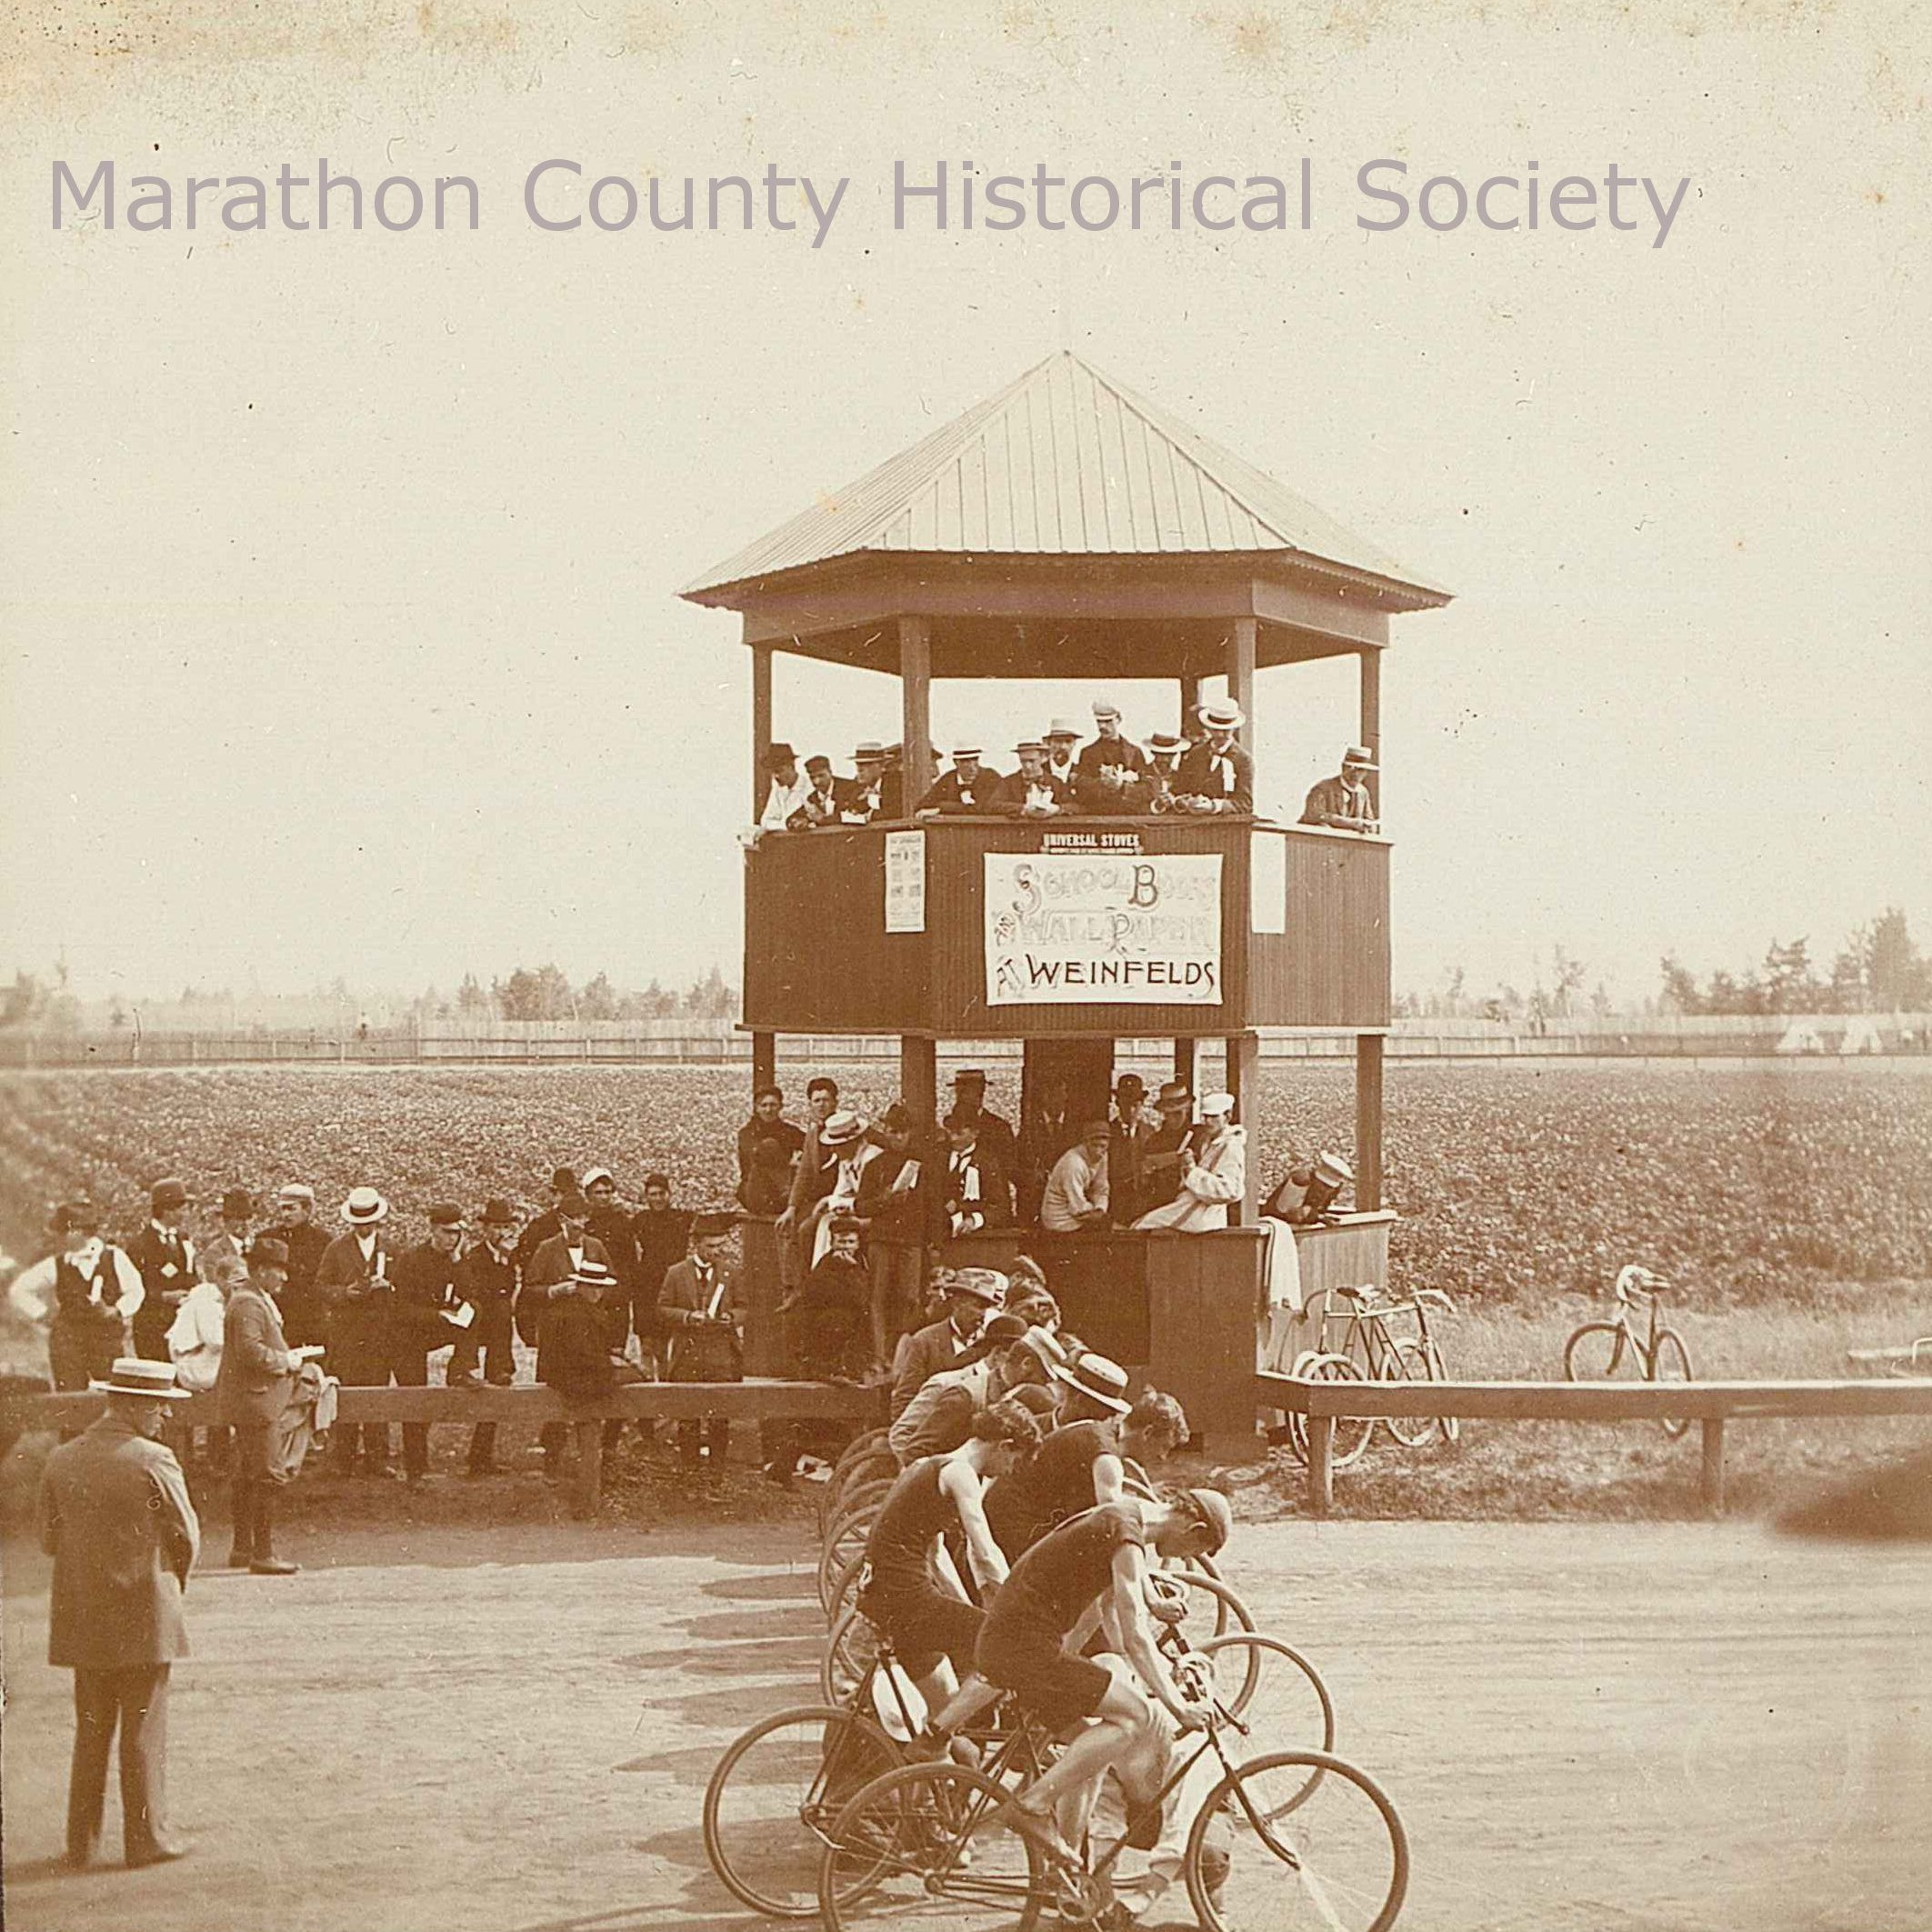 Cycling race circa 1920s-30s